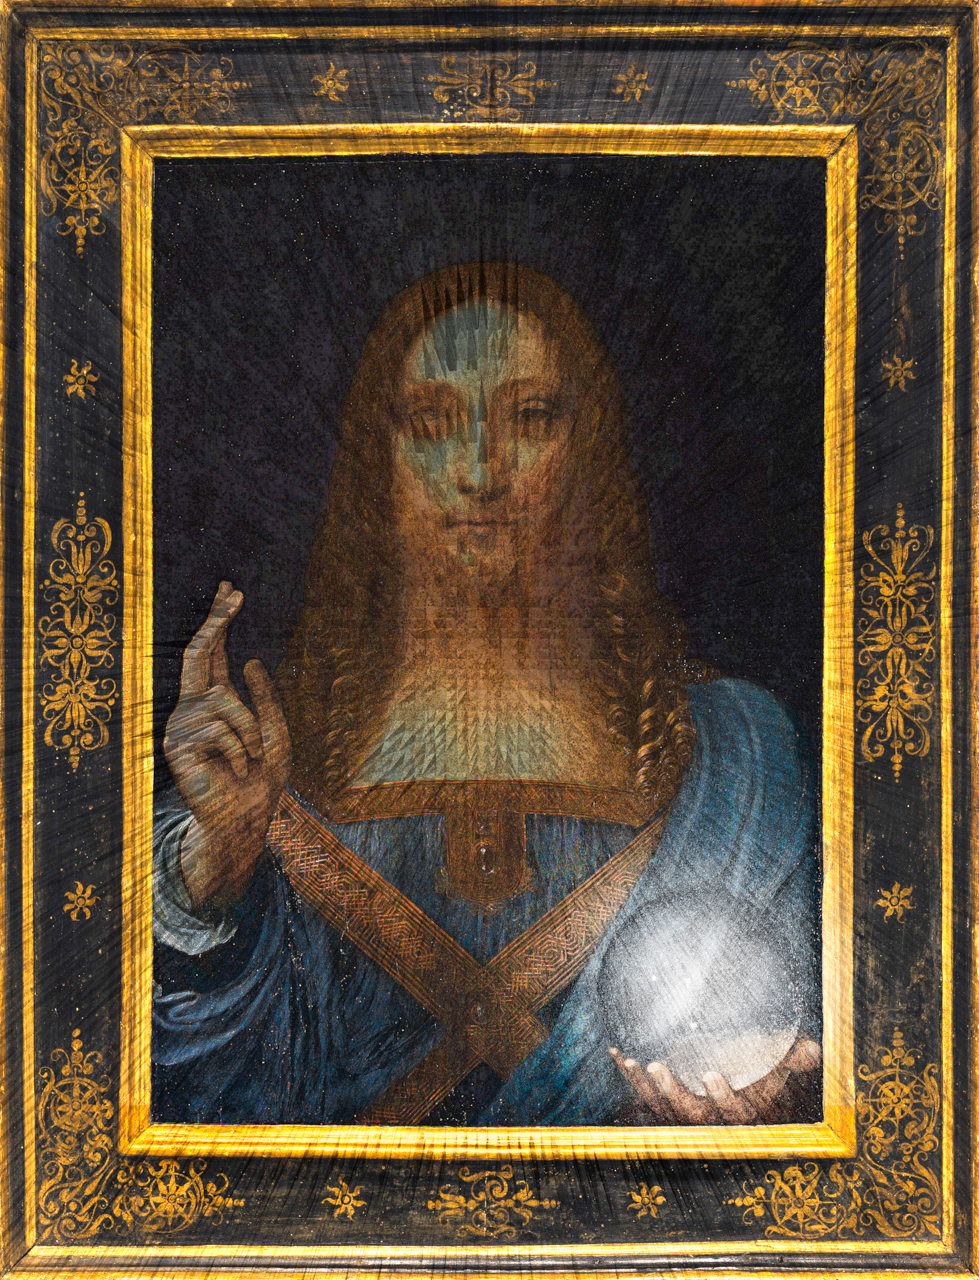 da Vinci, Leonardo (Salvador Mundi 1452)